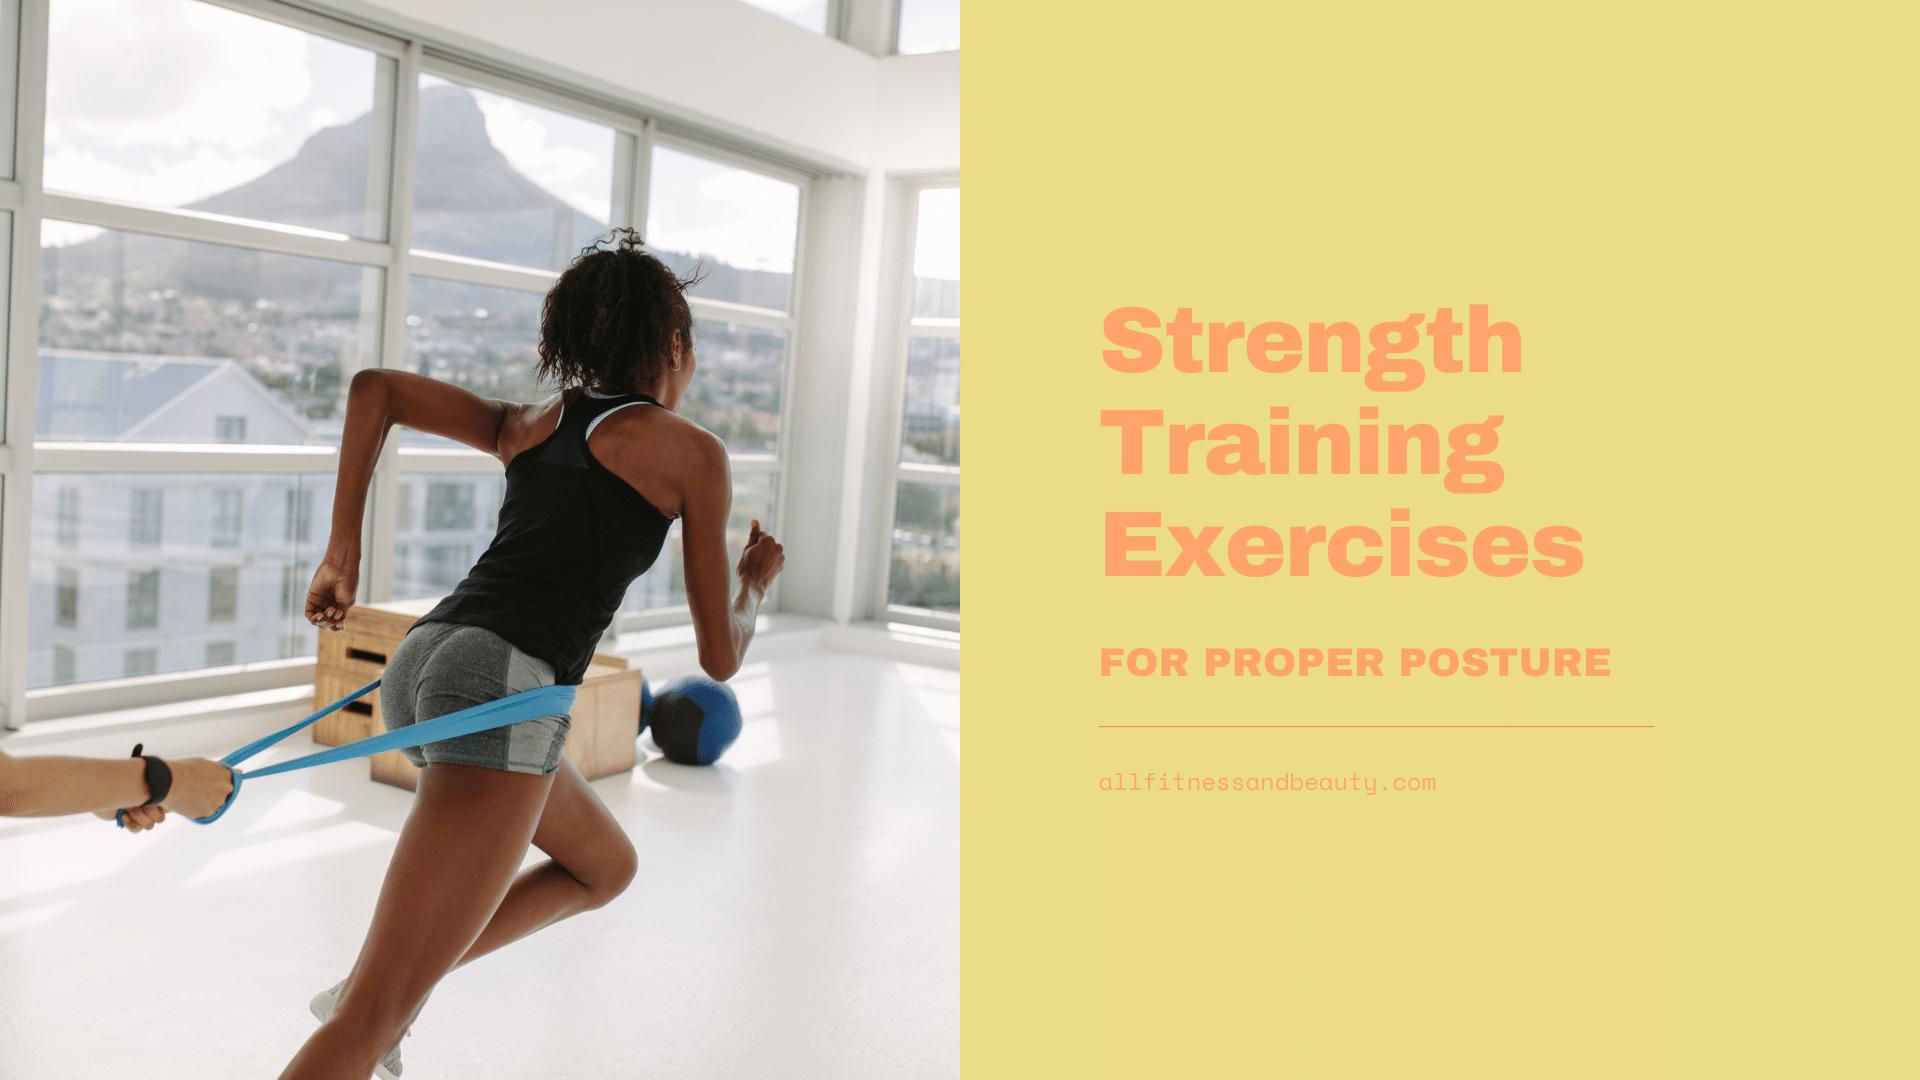 strength training exercises for proper posture